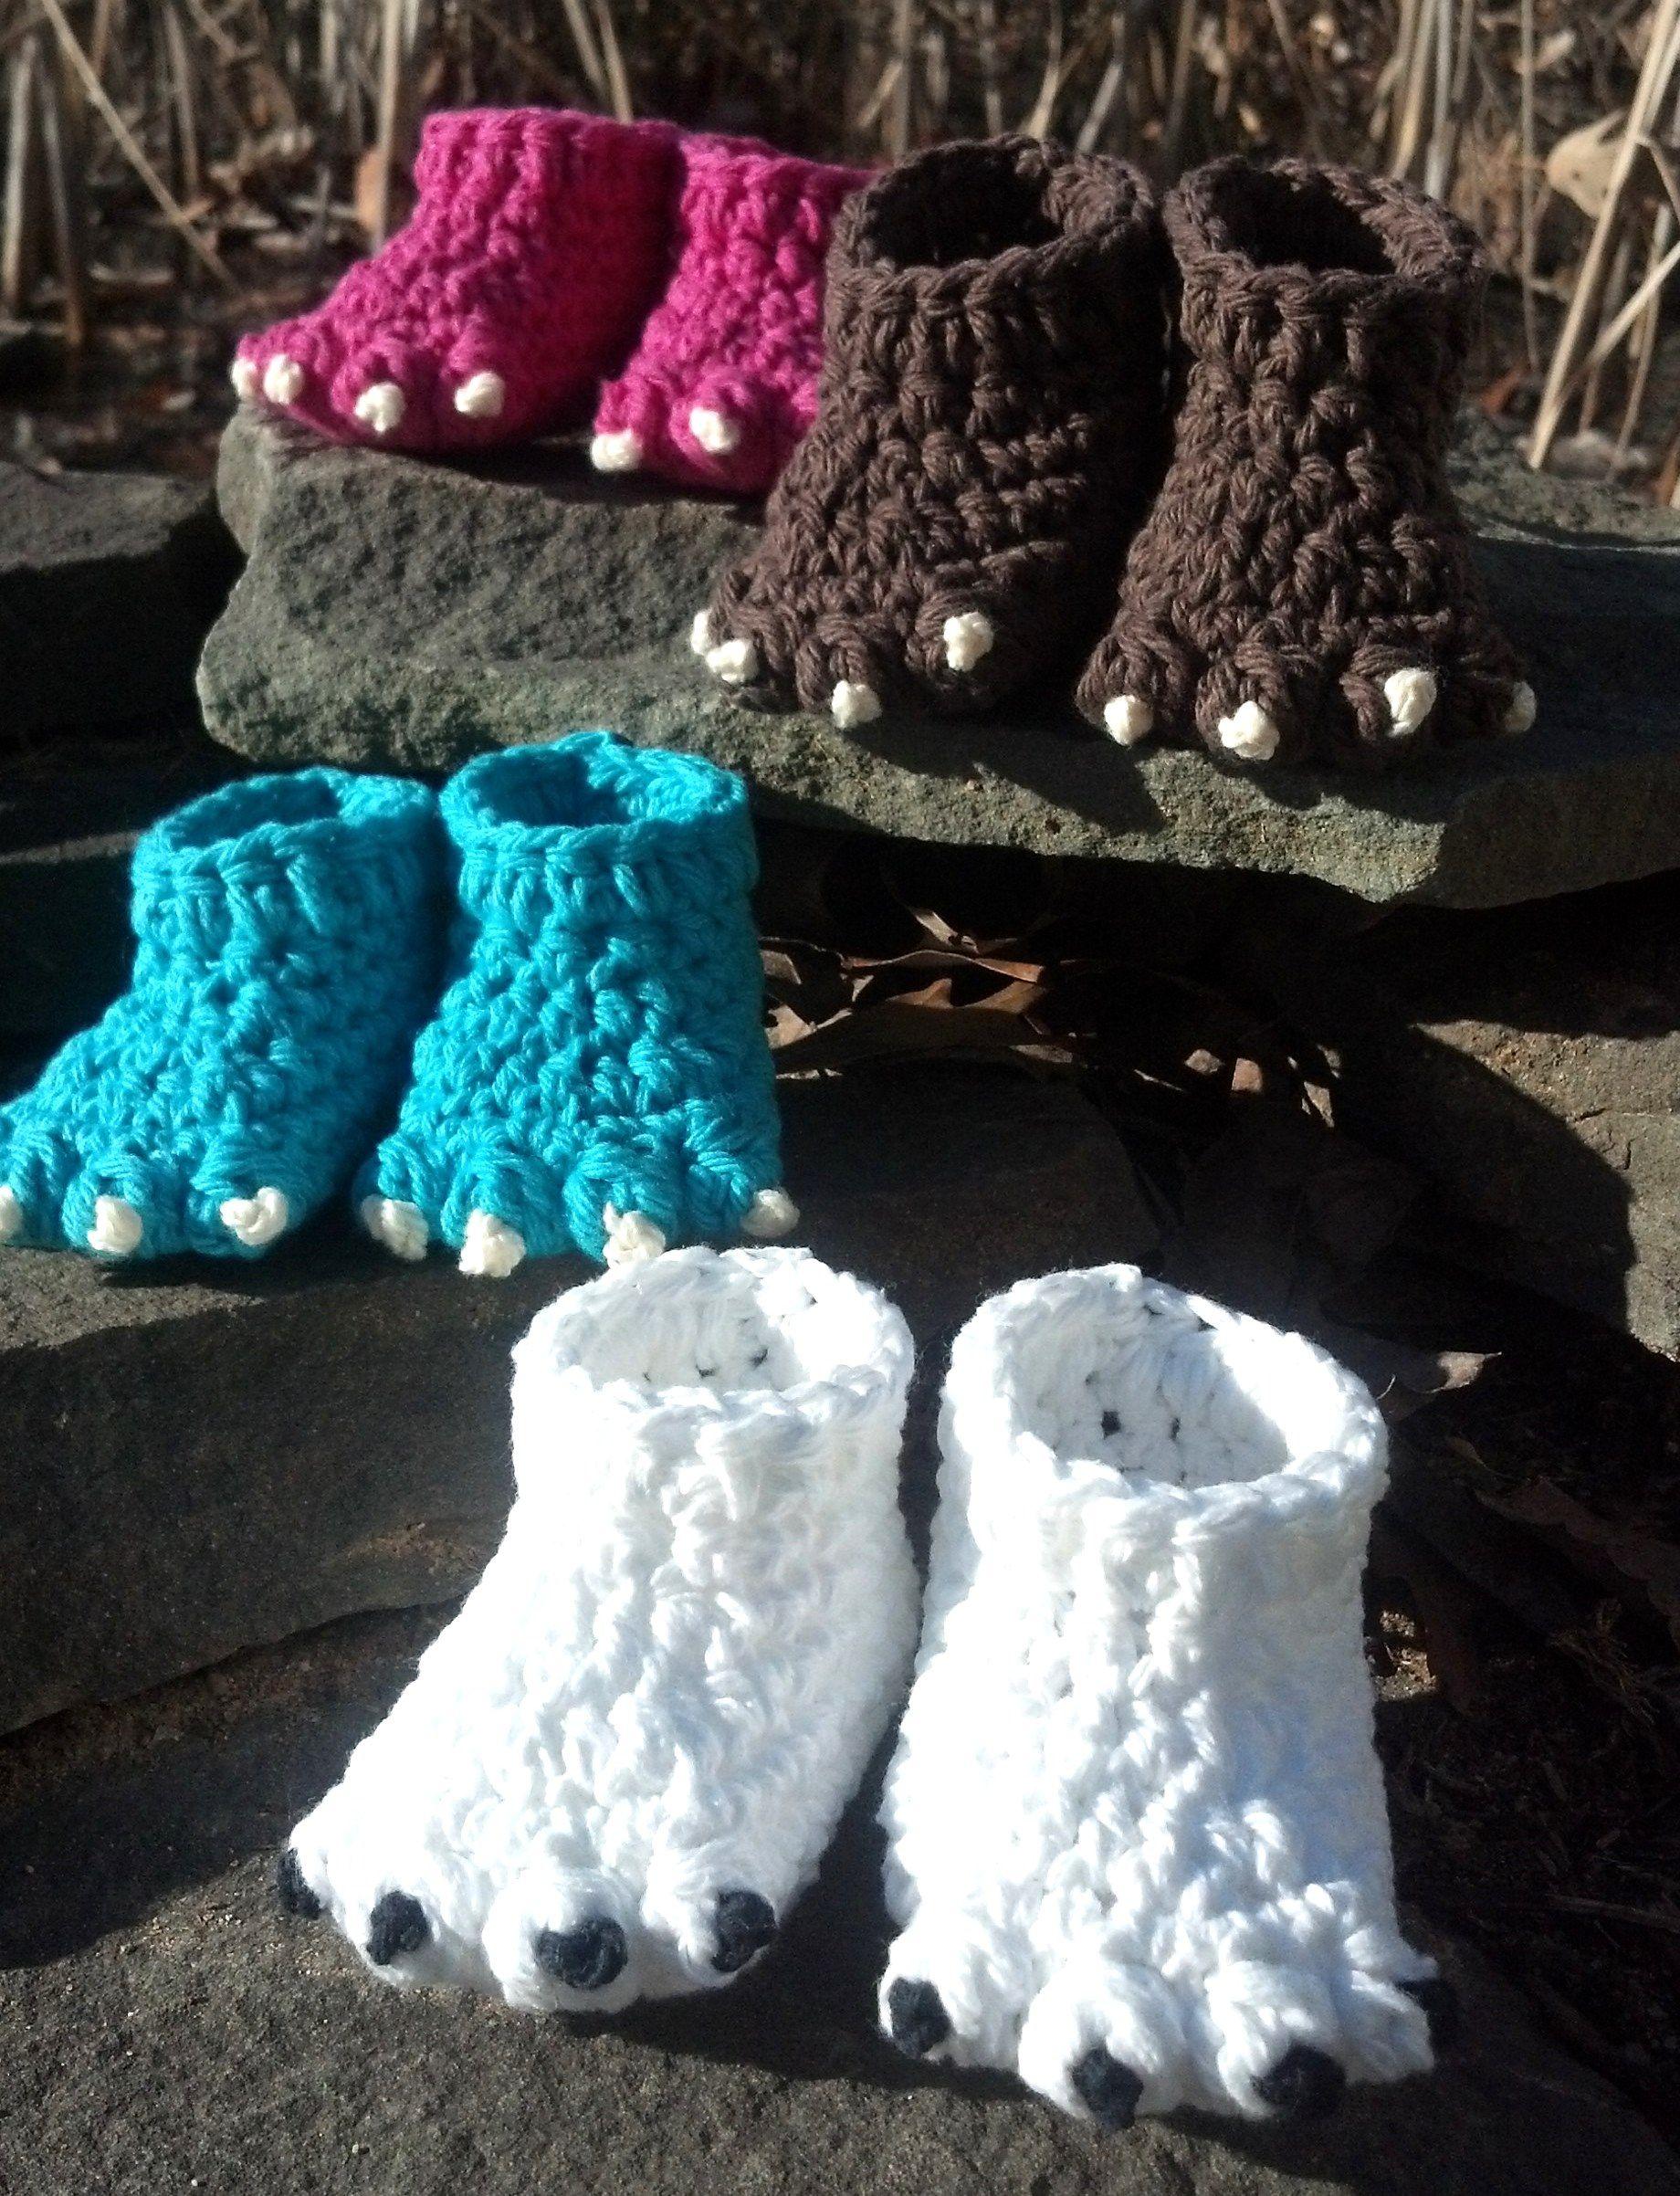 Garritas de lana al crochet | Tejidos | Pinterest | Garra, Lana y Tejido